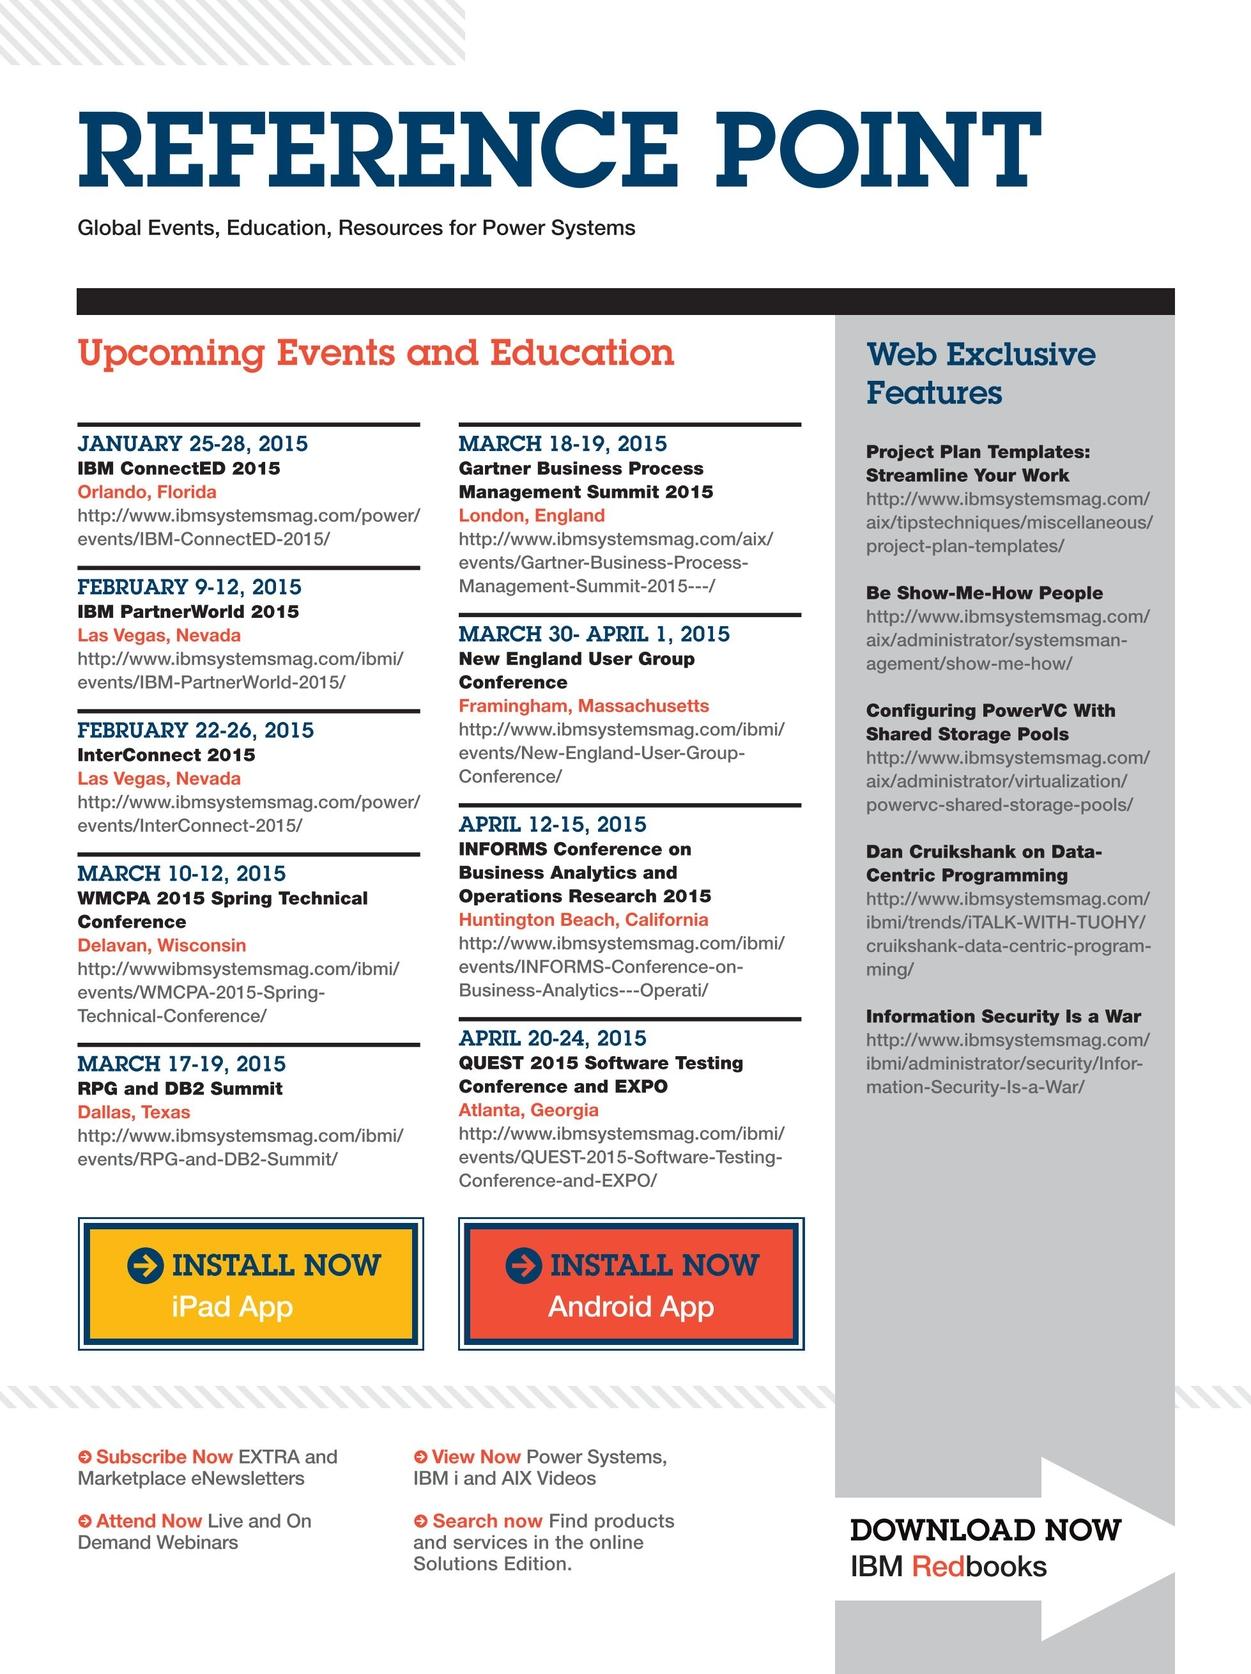 IBM Systems Magazine, Power Systems - January 2015